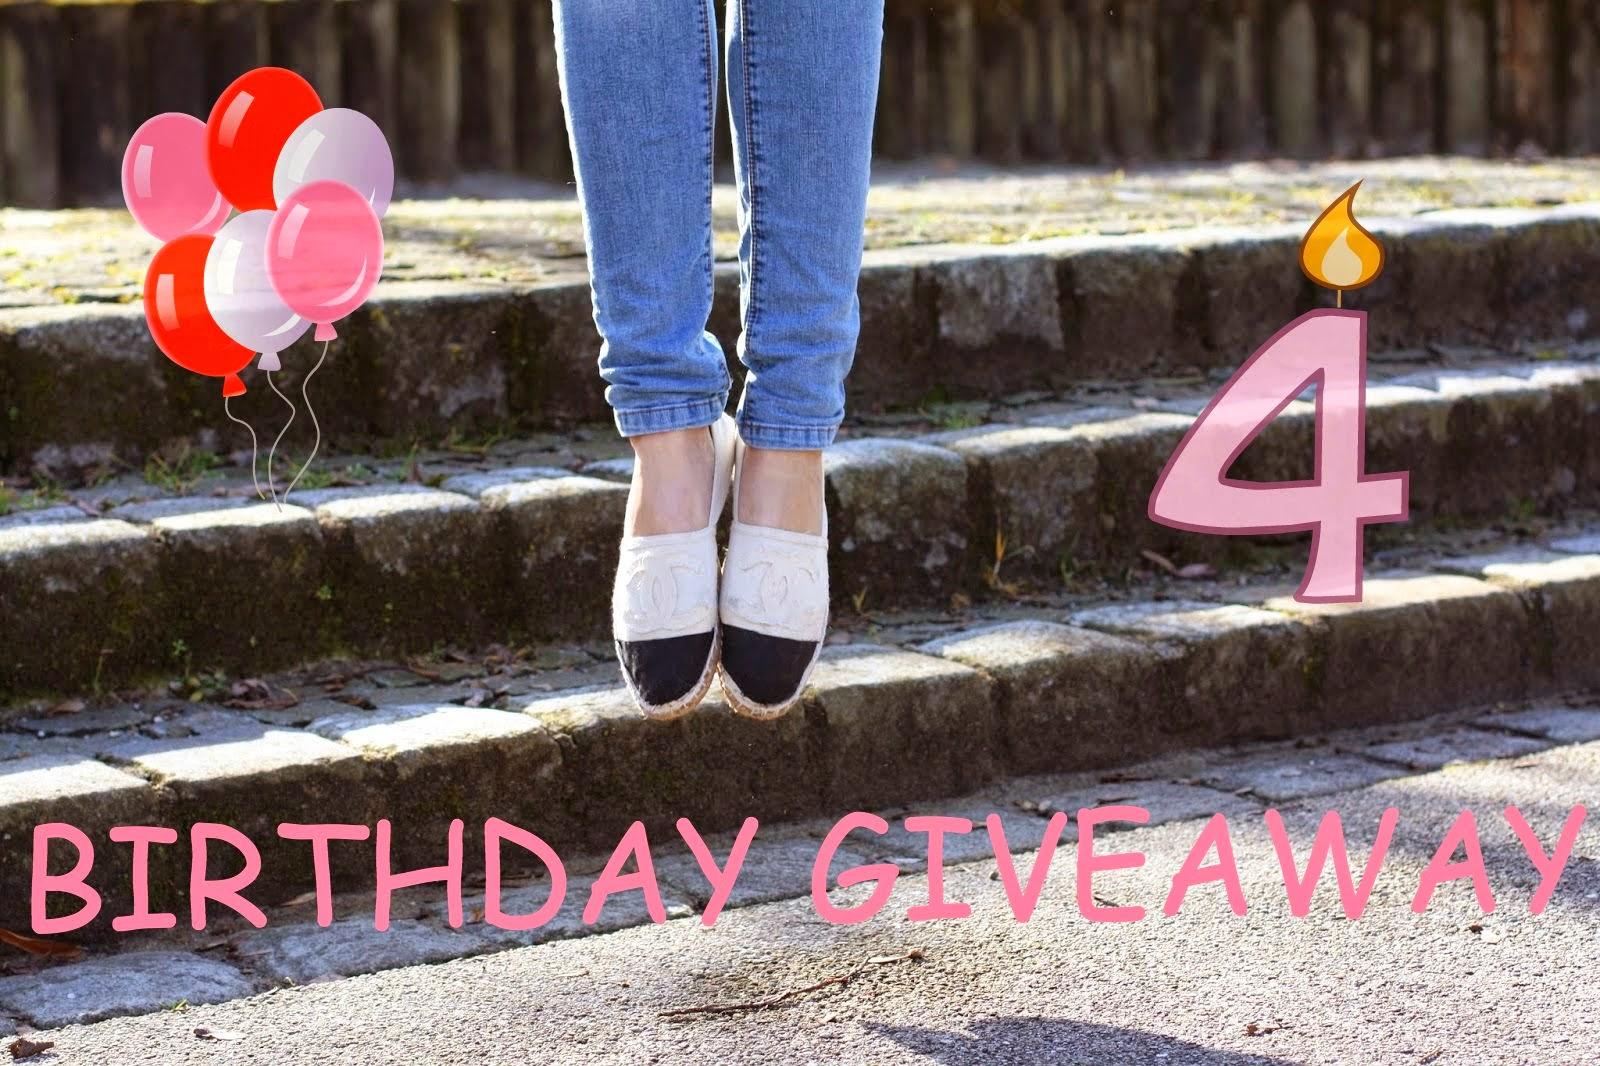 Gewinnspiel, Giveaway, Fashionblog, Modeblog, Chanel Espadrilles